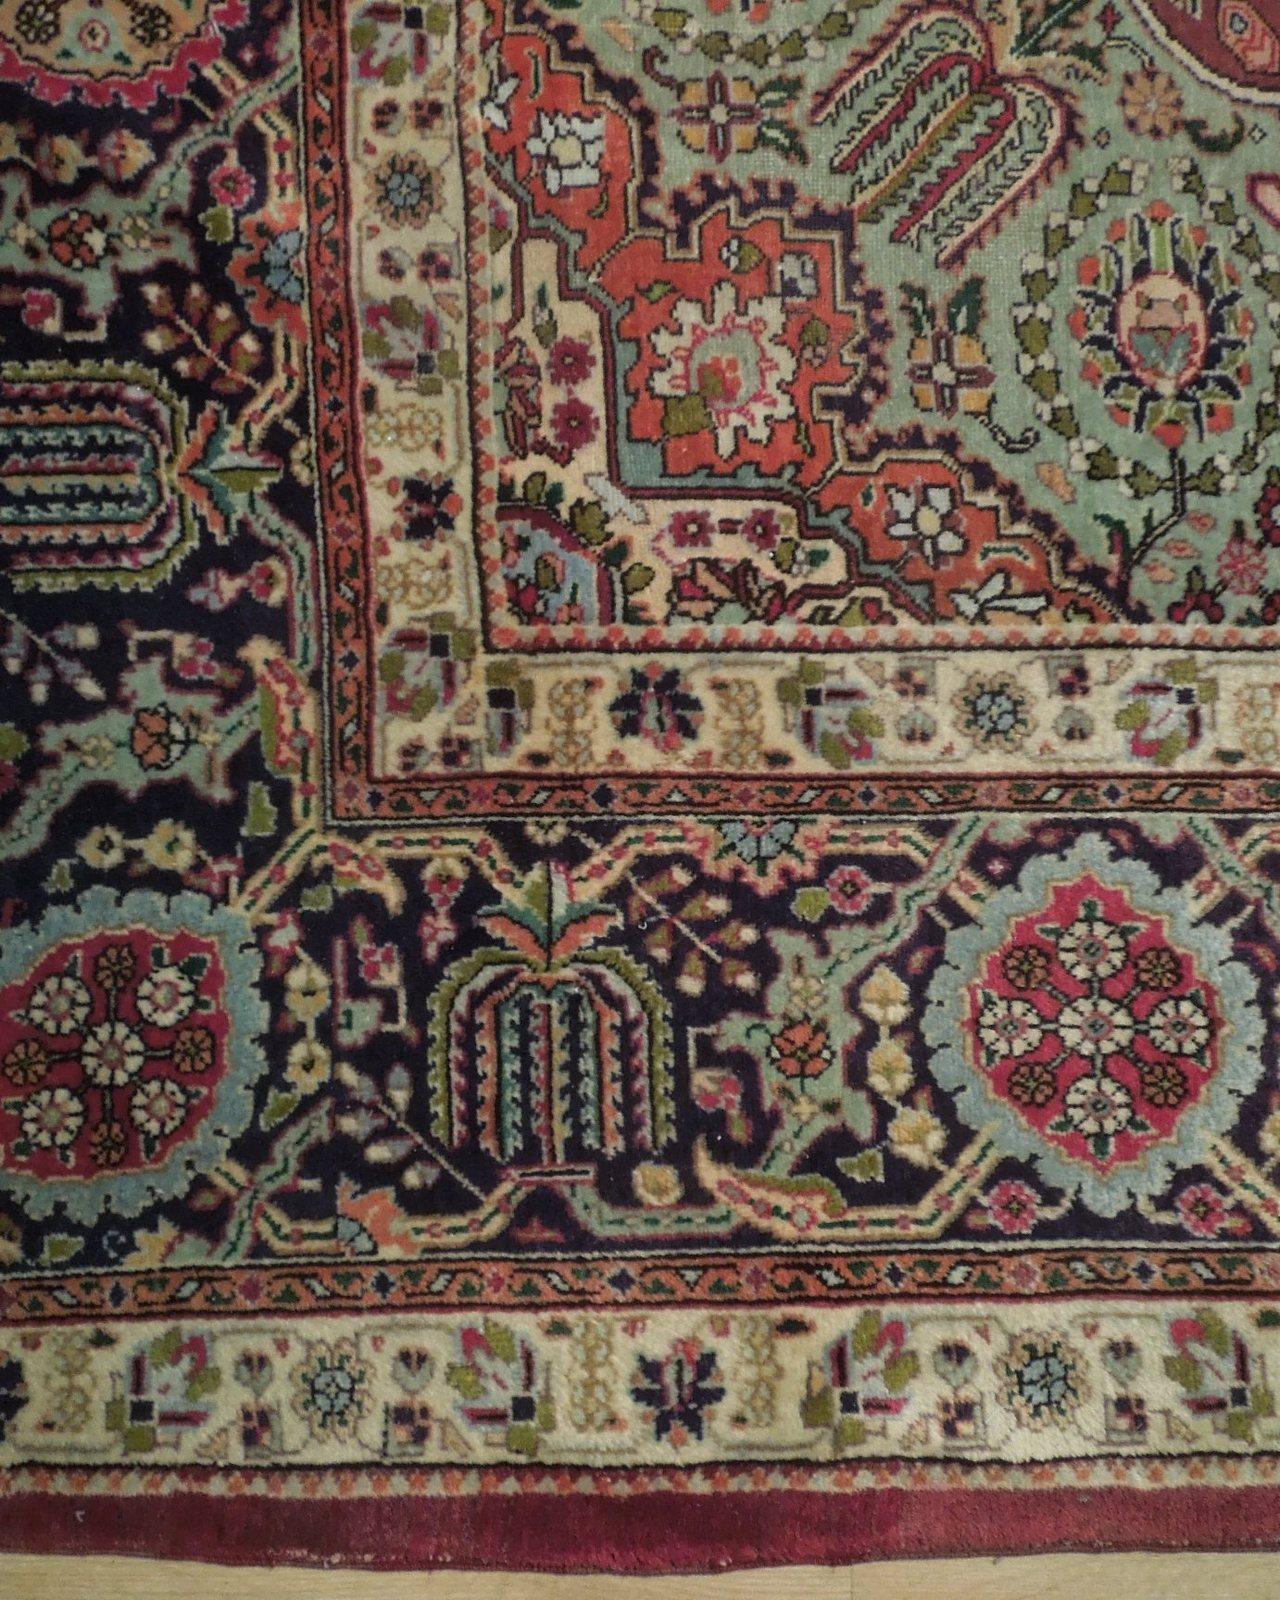 Compex Design Original Red Traditional Persian Wool Handmade Rug 10x16 Rug image 2